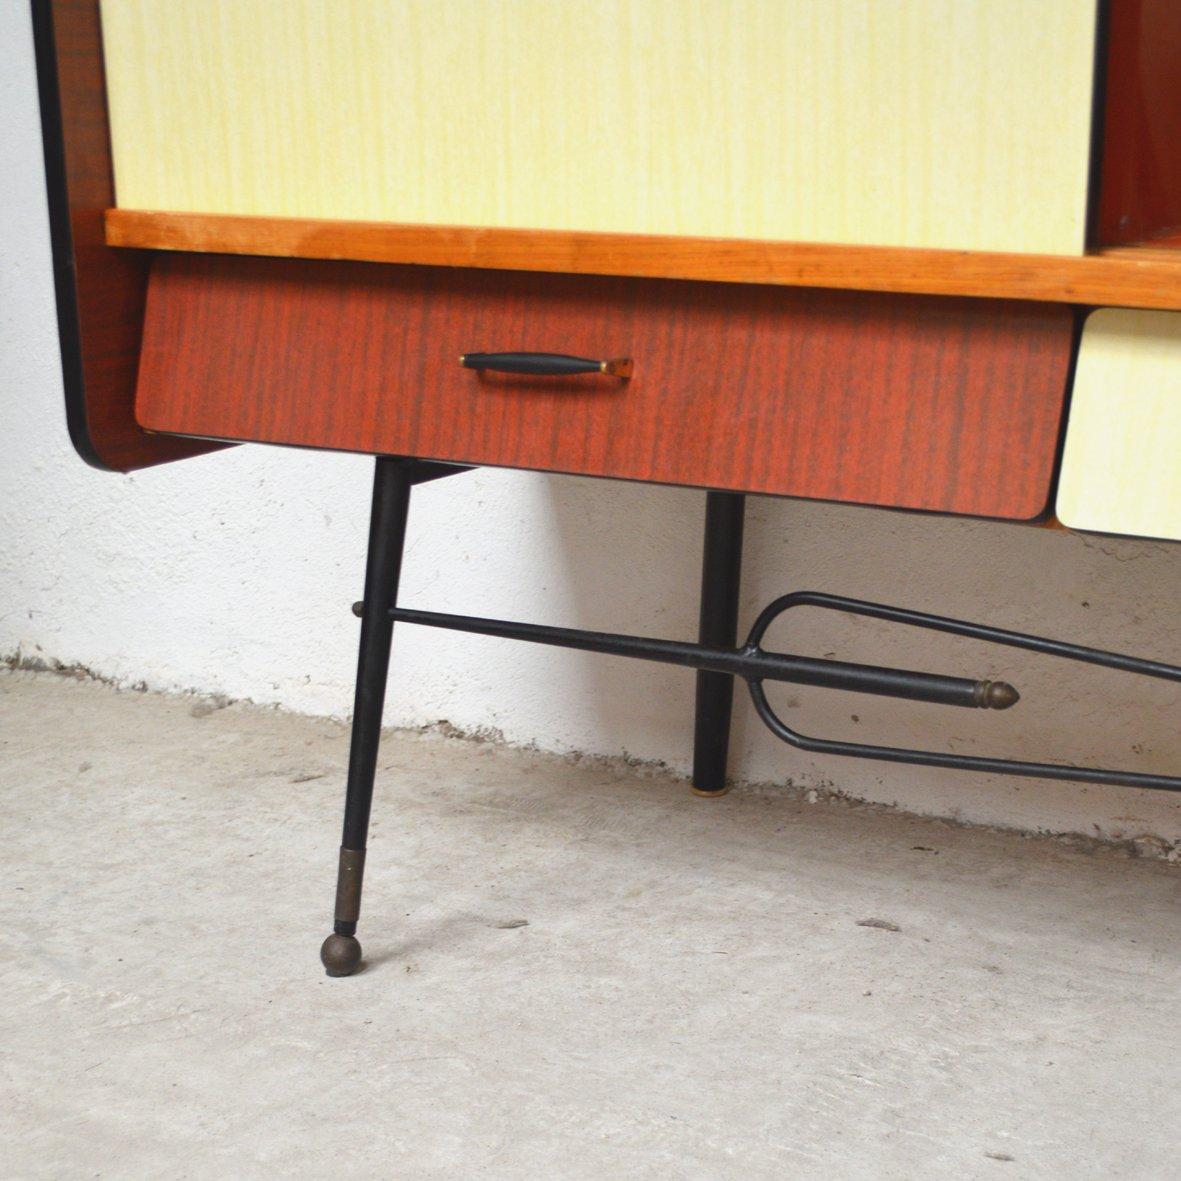 enfilade en formica 1950s en vente sur pamono. Black Bedroom Furniture Sets. Home Design Ideas